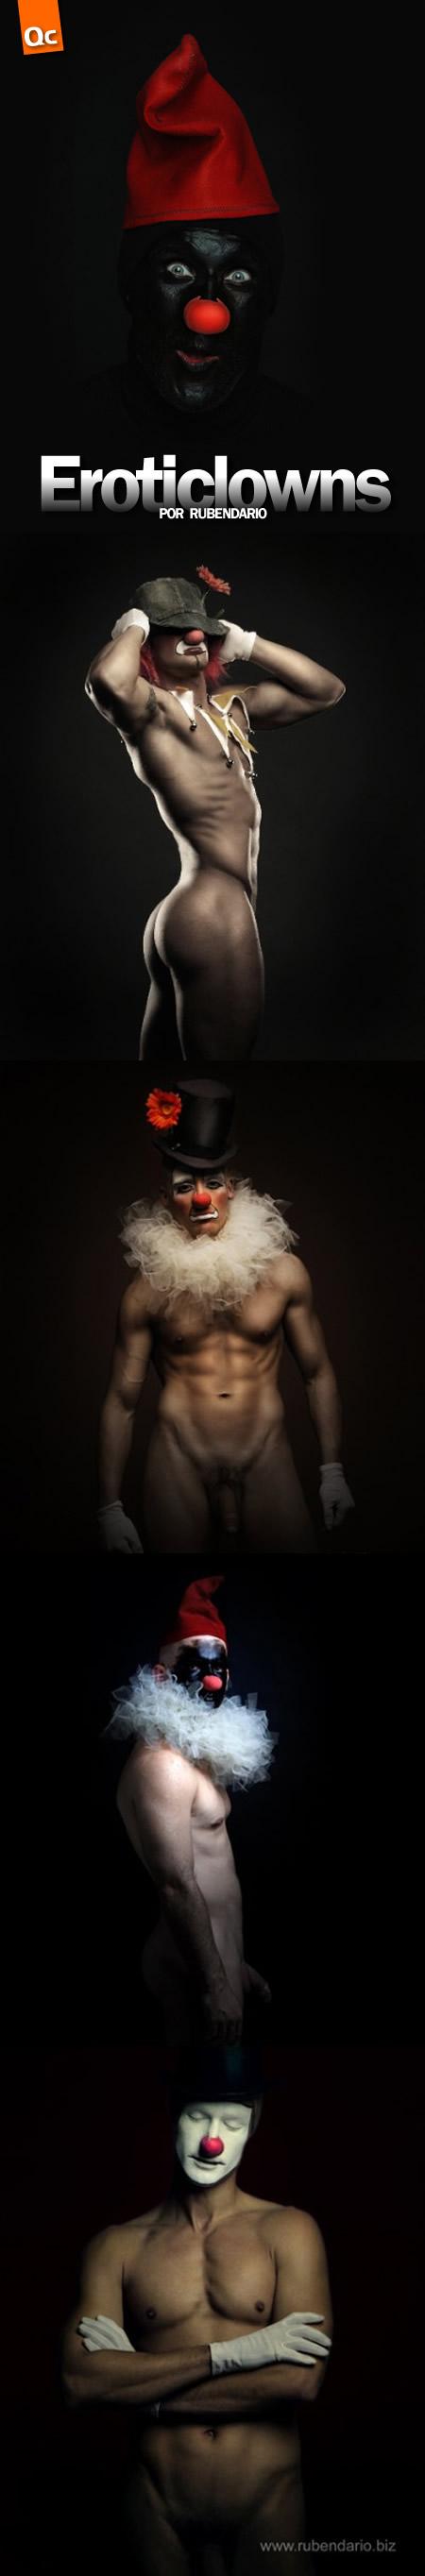 Rubendario: Eroticlowns